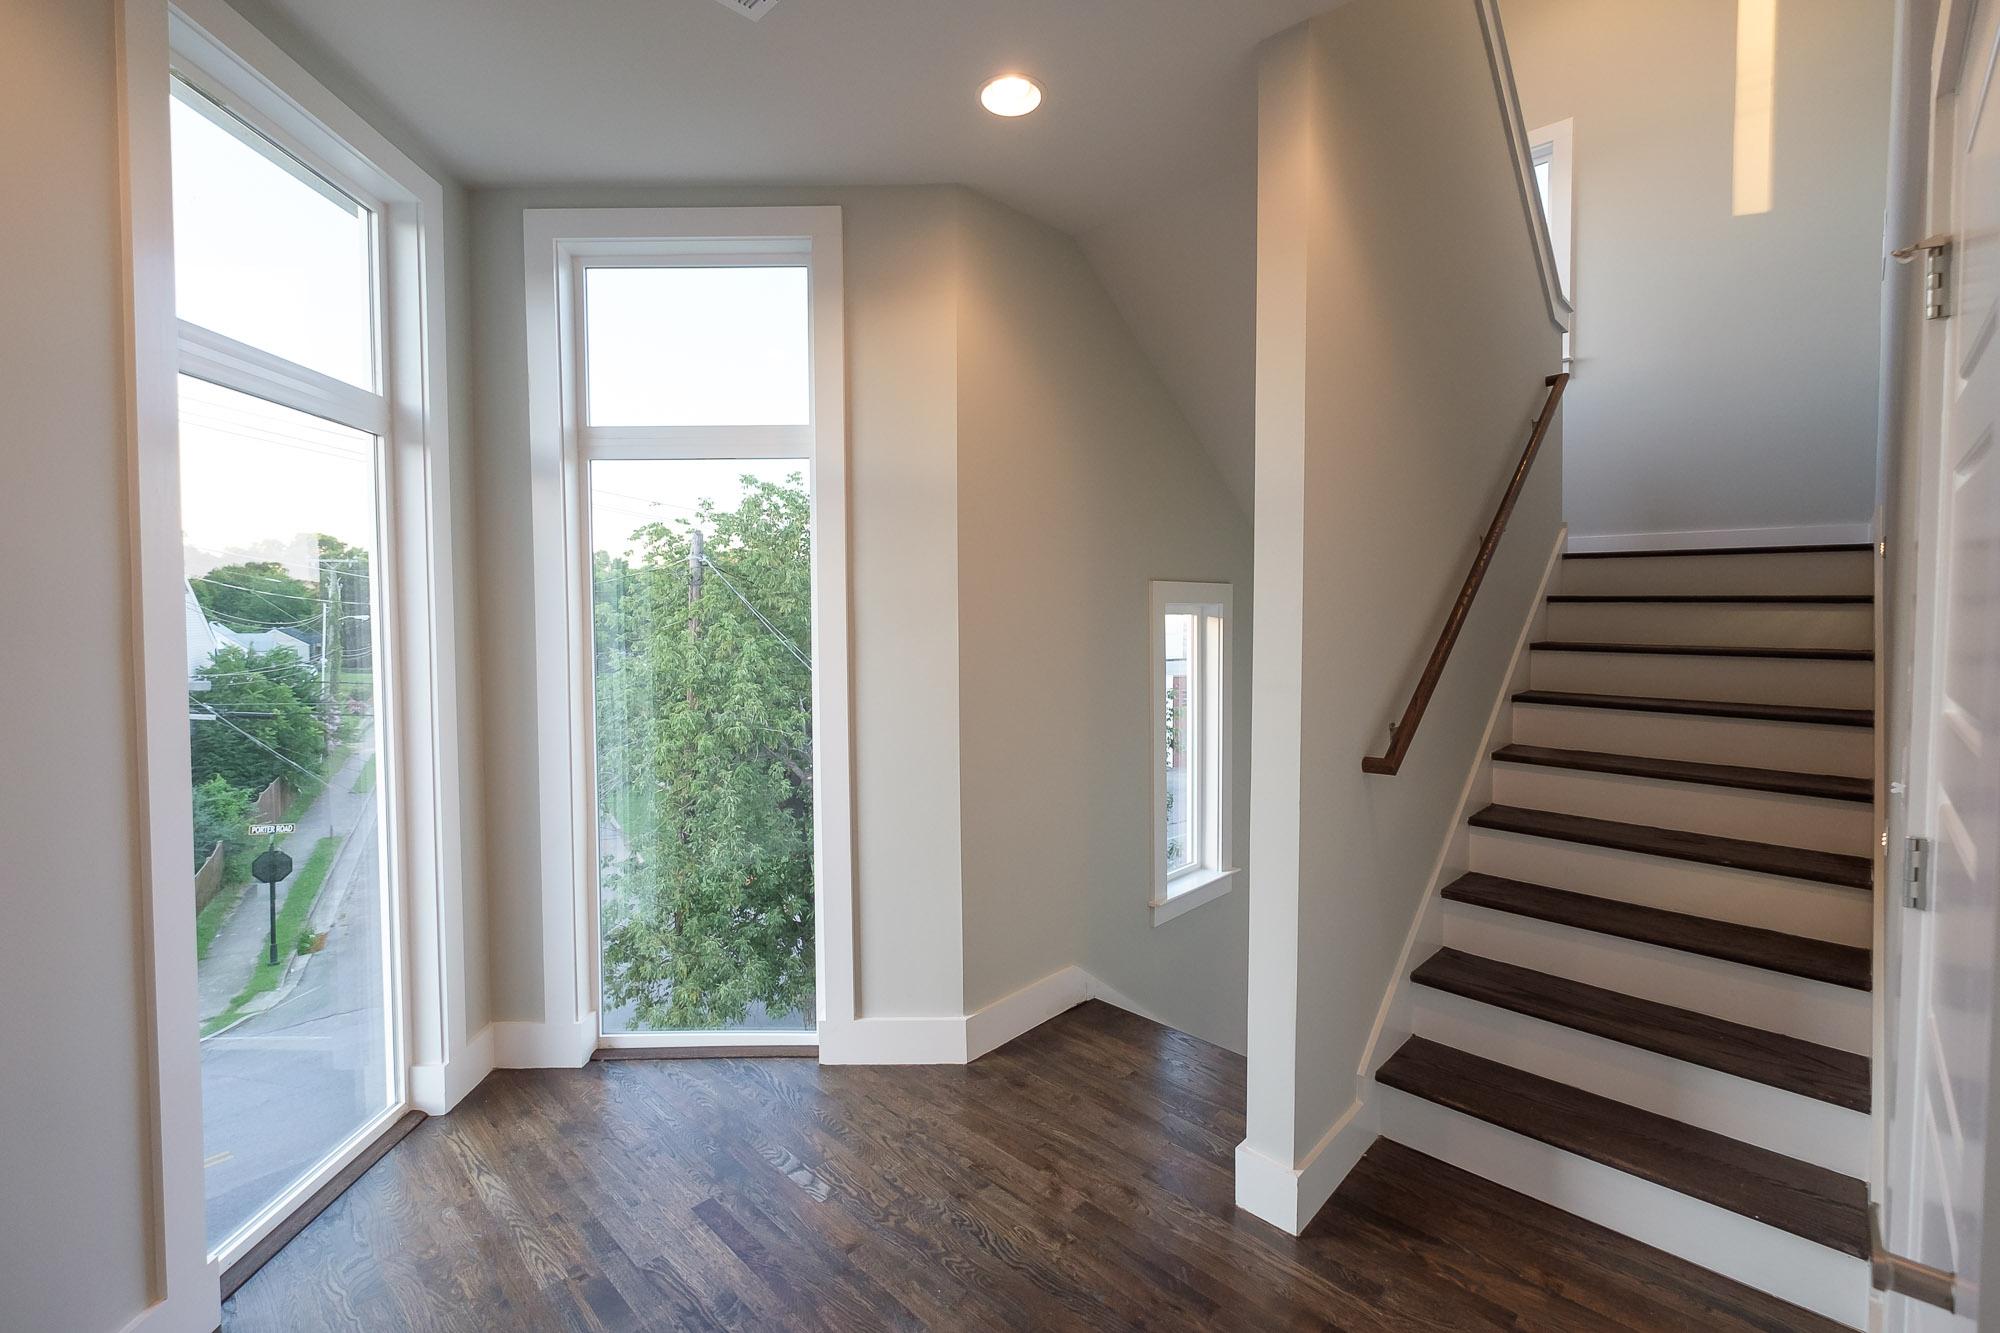 House-Plans-Online-Duplex-Nashville-Peggy-Newman-Stairs-Ceiling to Floor-Windows-Porter.jpg